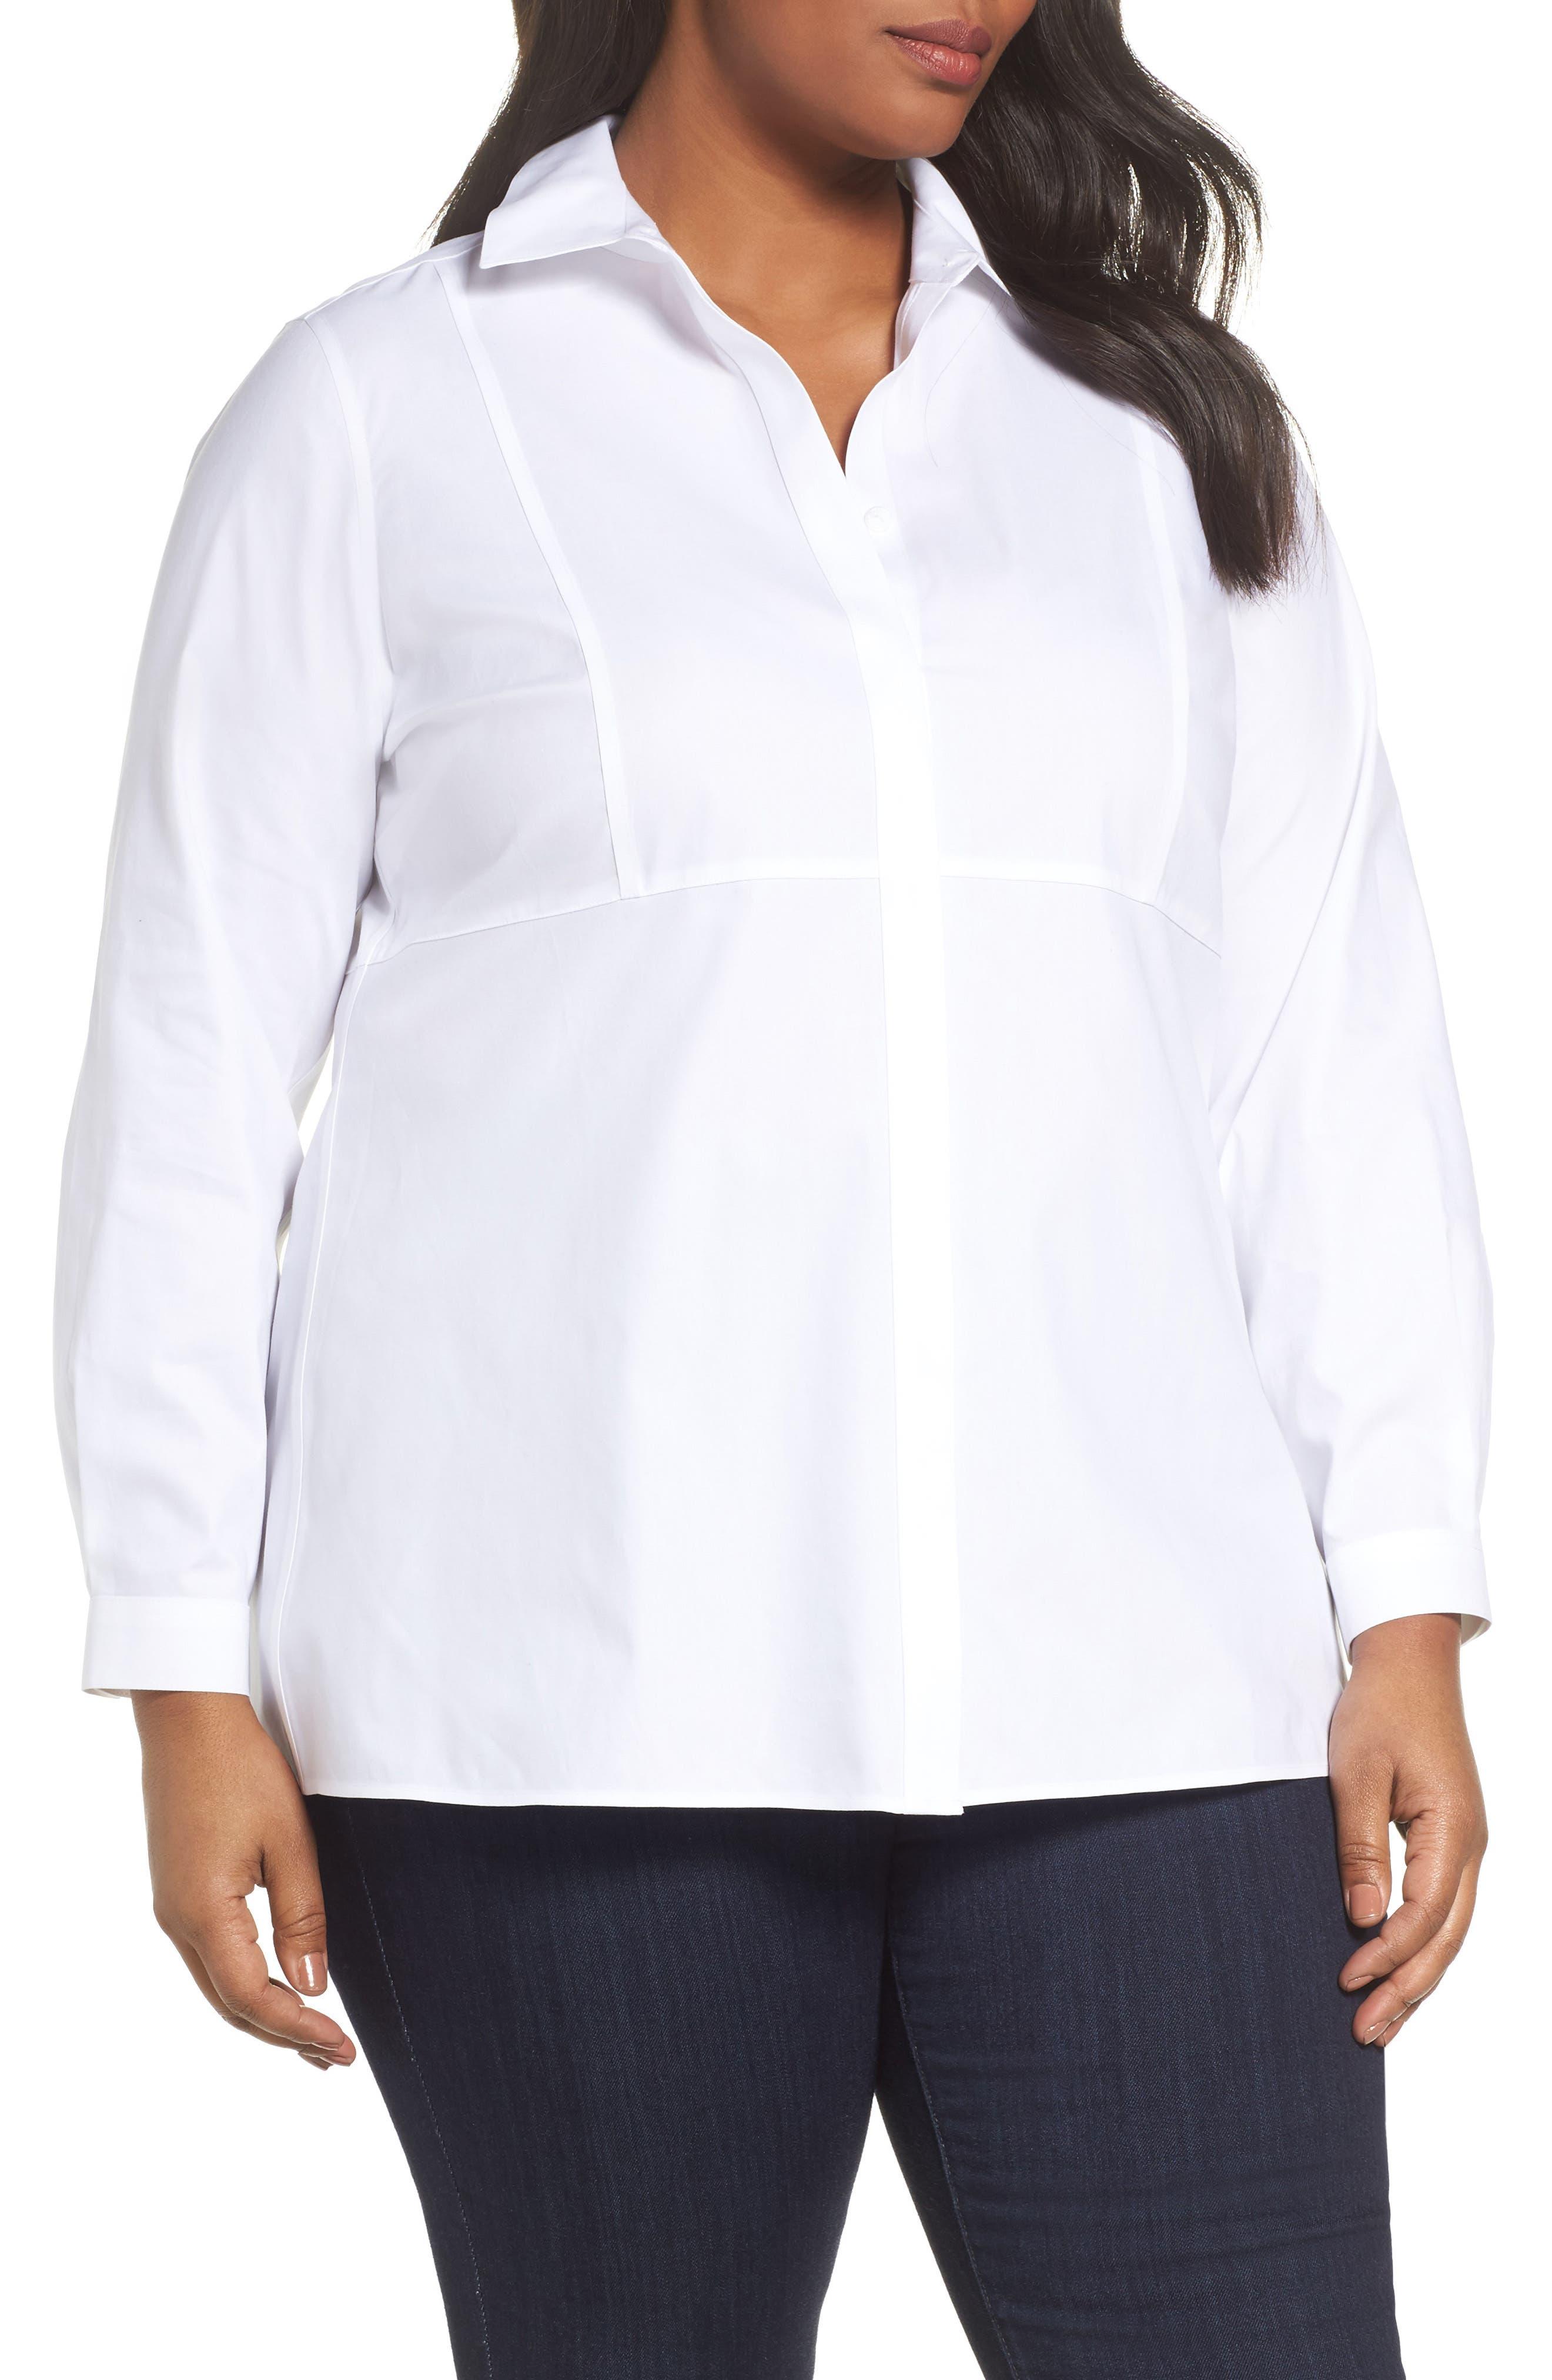 PINPOINT OXFORD CLOTH SHIRT